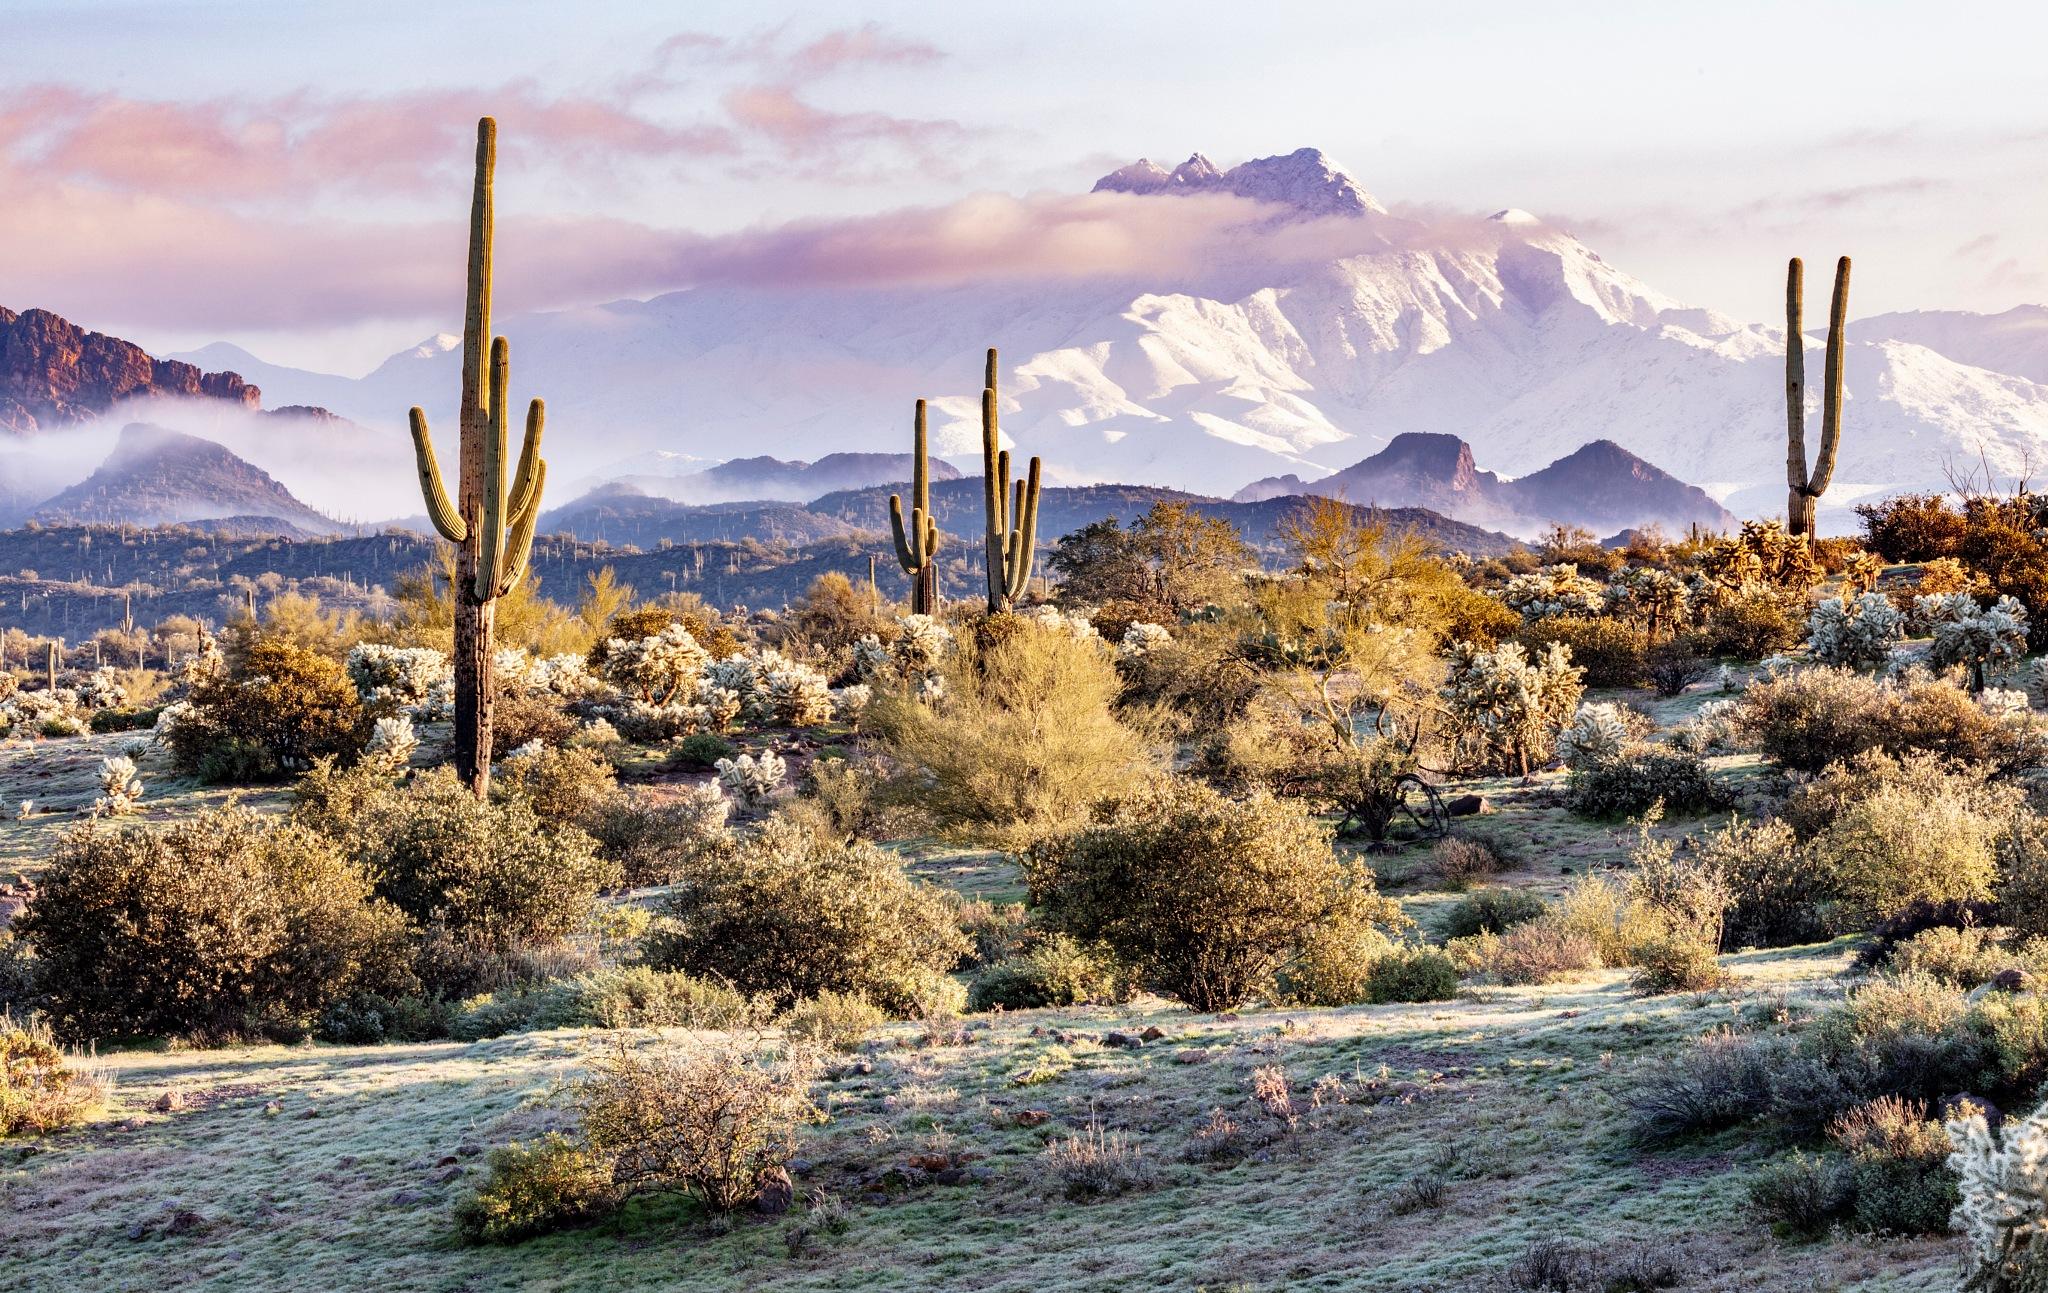 Desert Snow by RonaldSill